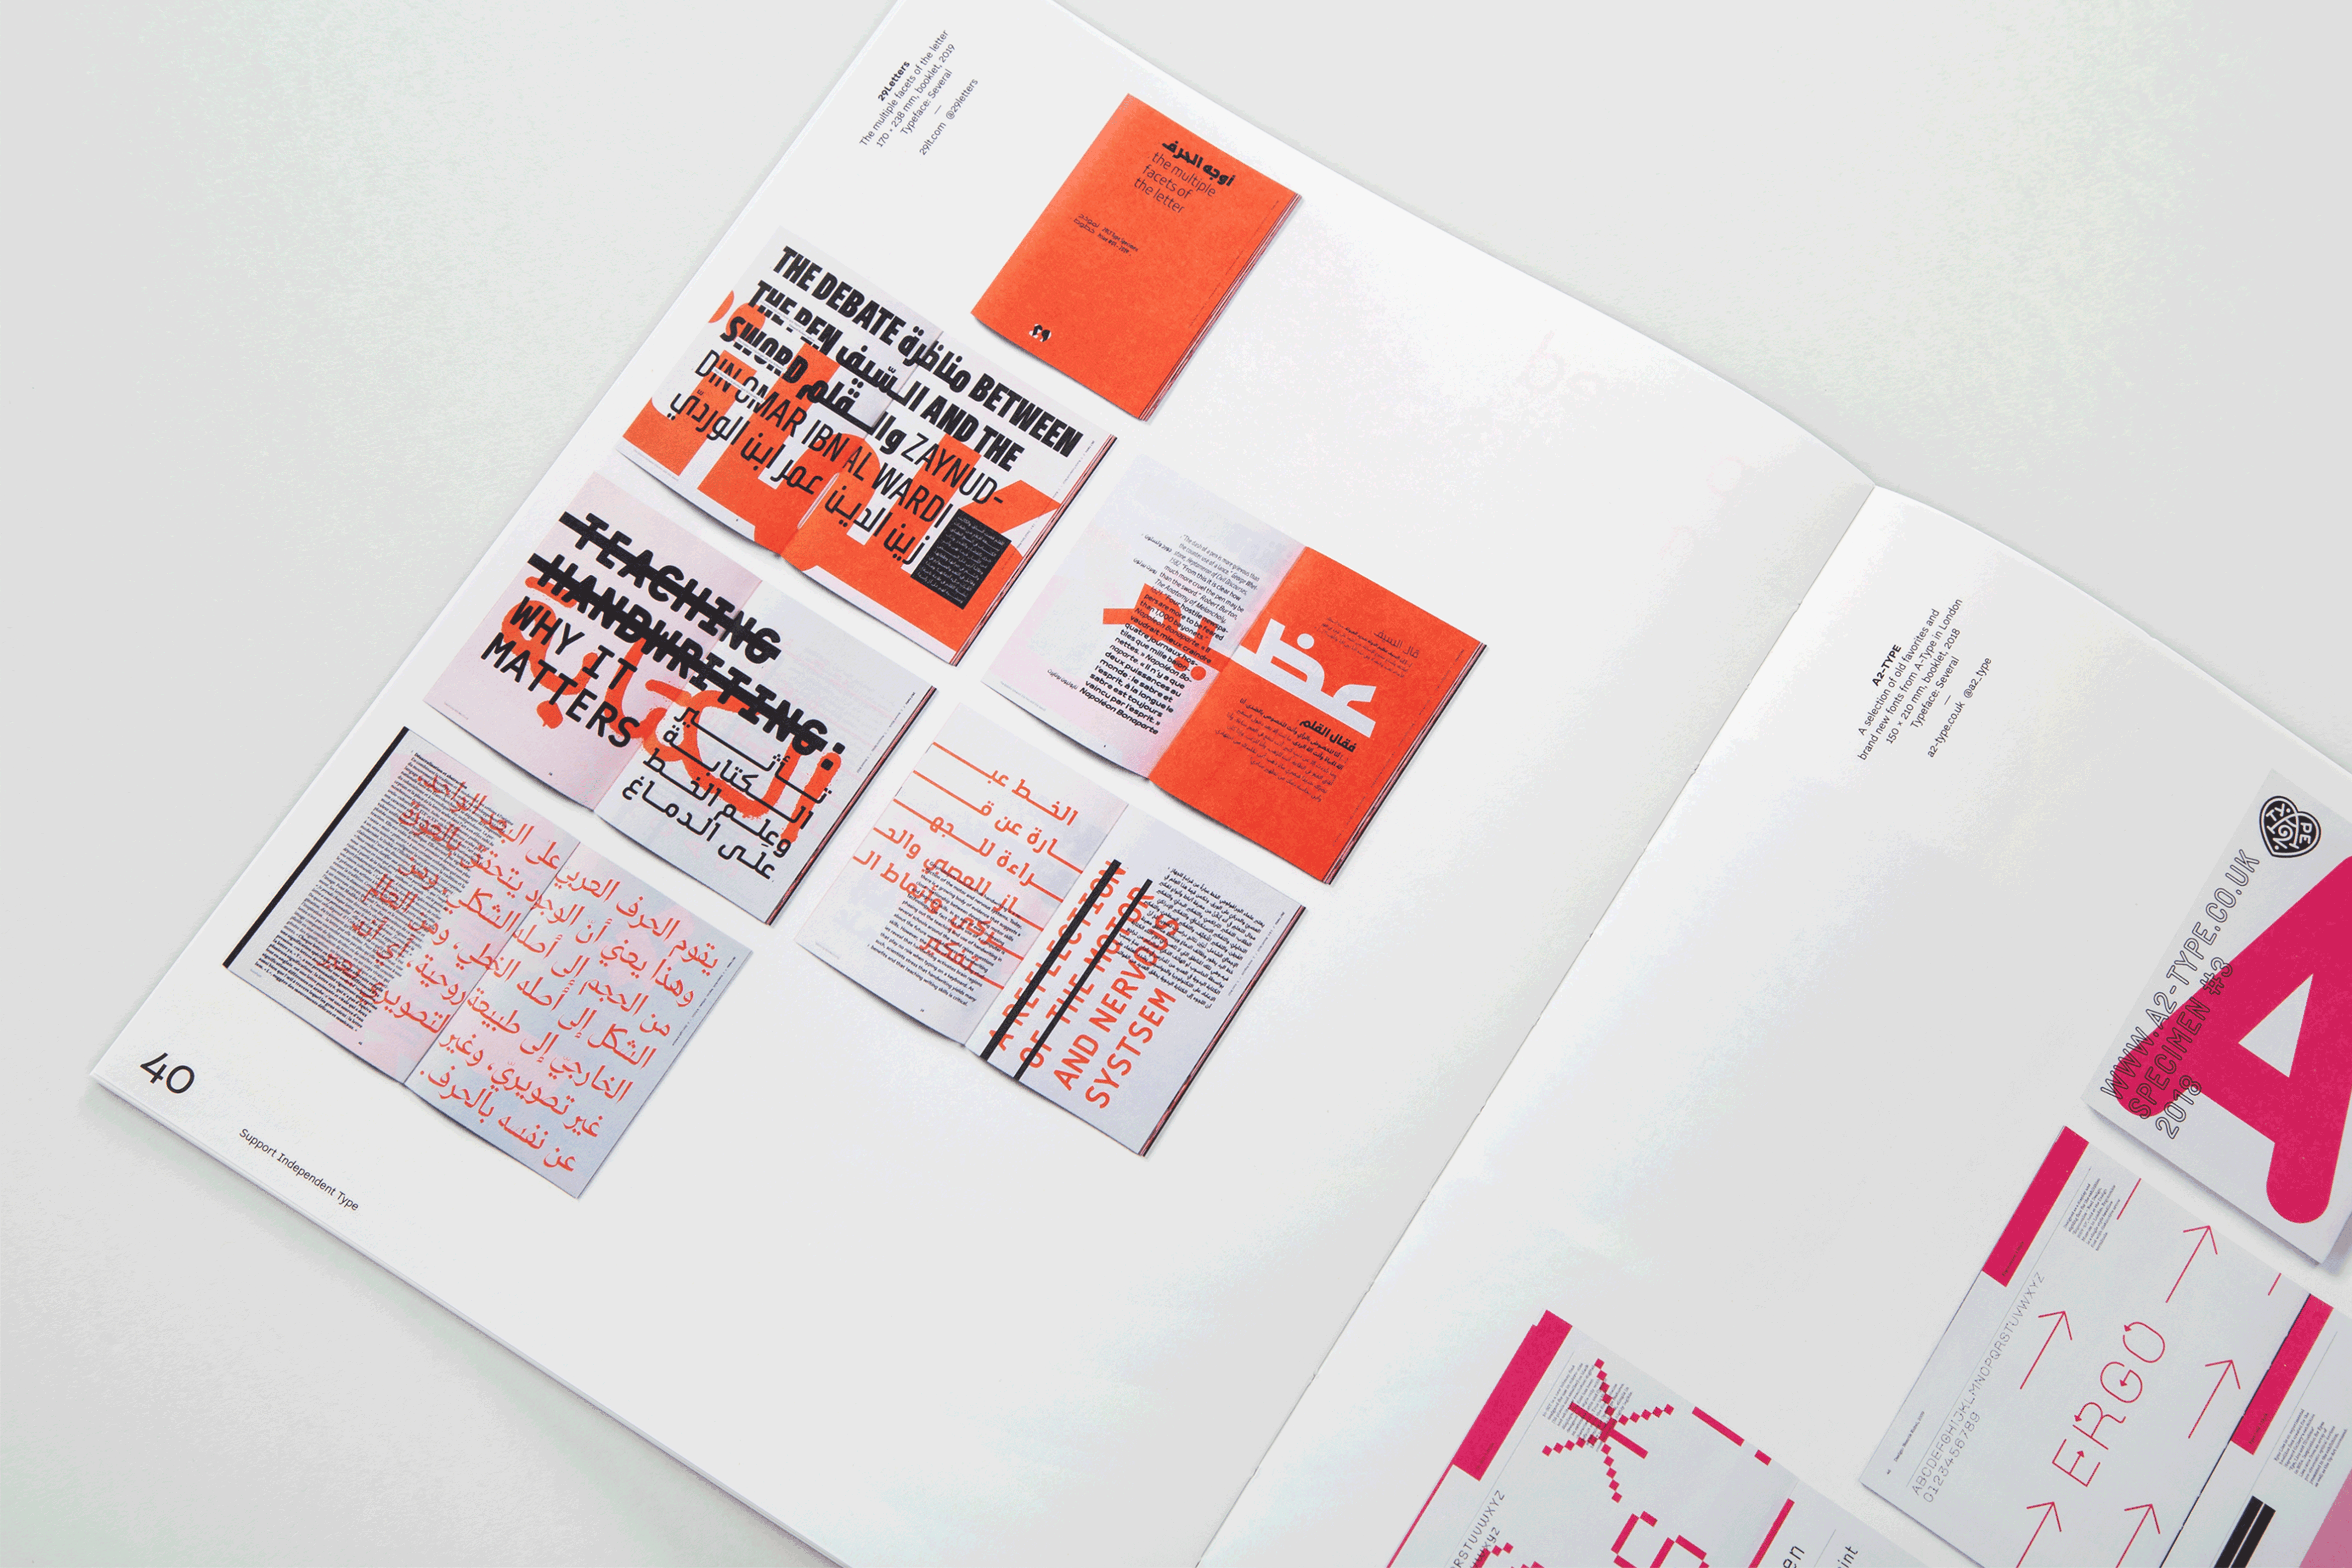 Slanted-Publiaktionen-Slanted-Publishers-Support-Independent-Type_11